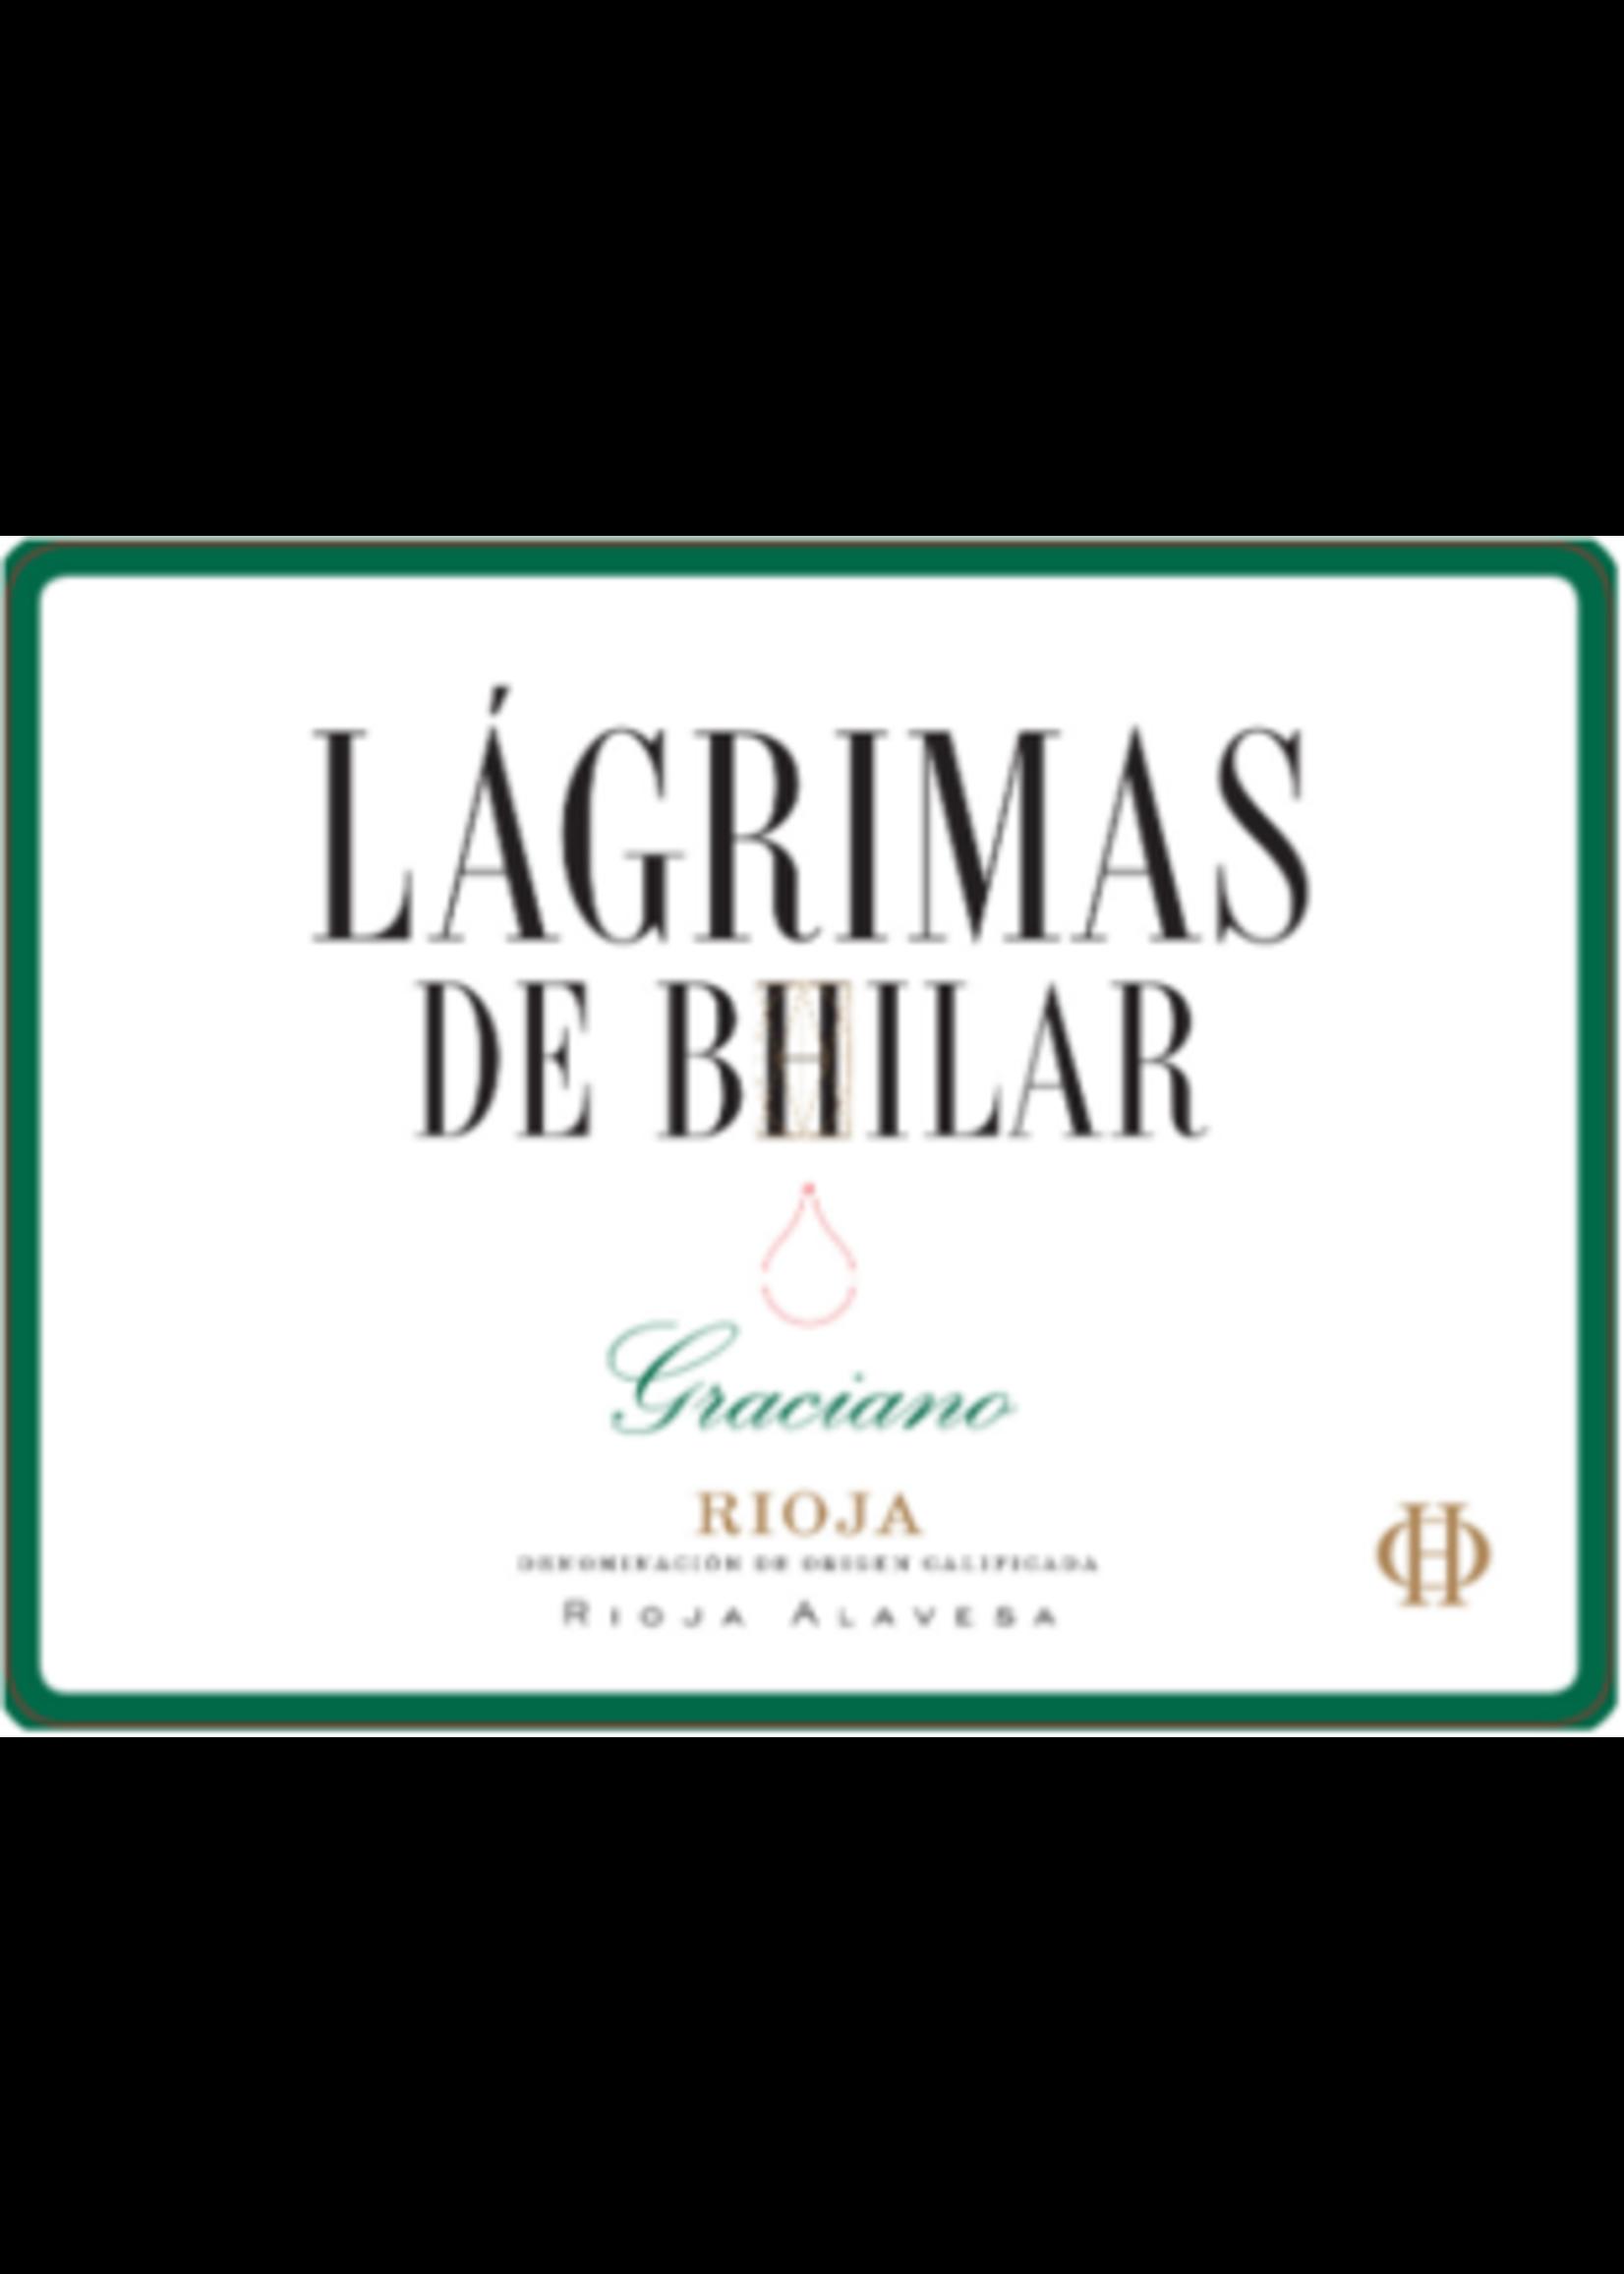 Bodegas Bhilar Bodegas Bhilar / Rioja Graciano Lágrimas de Bhilar 2019 / 750mL